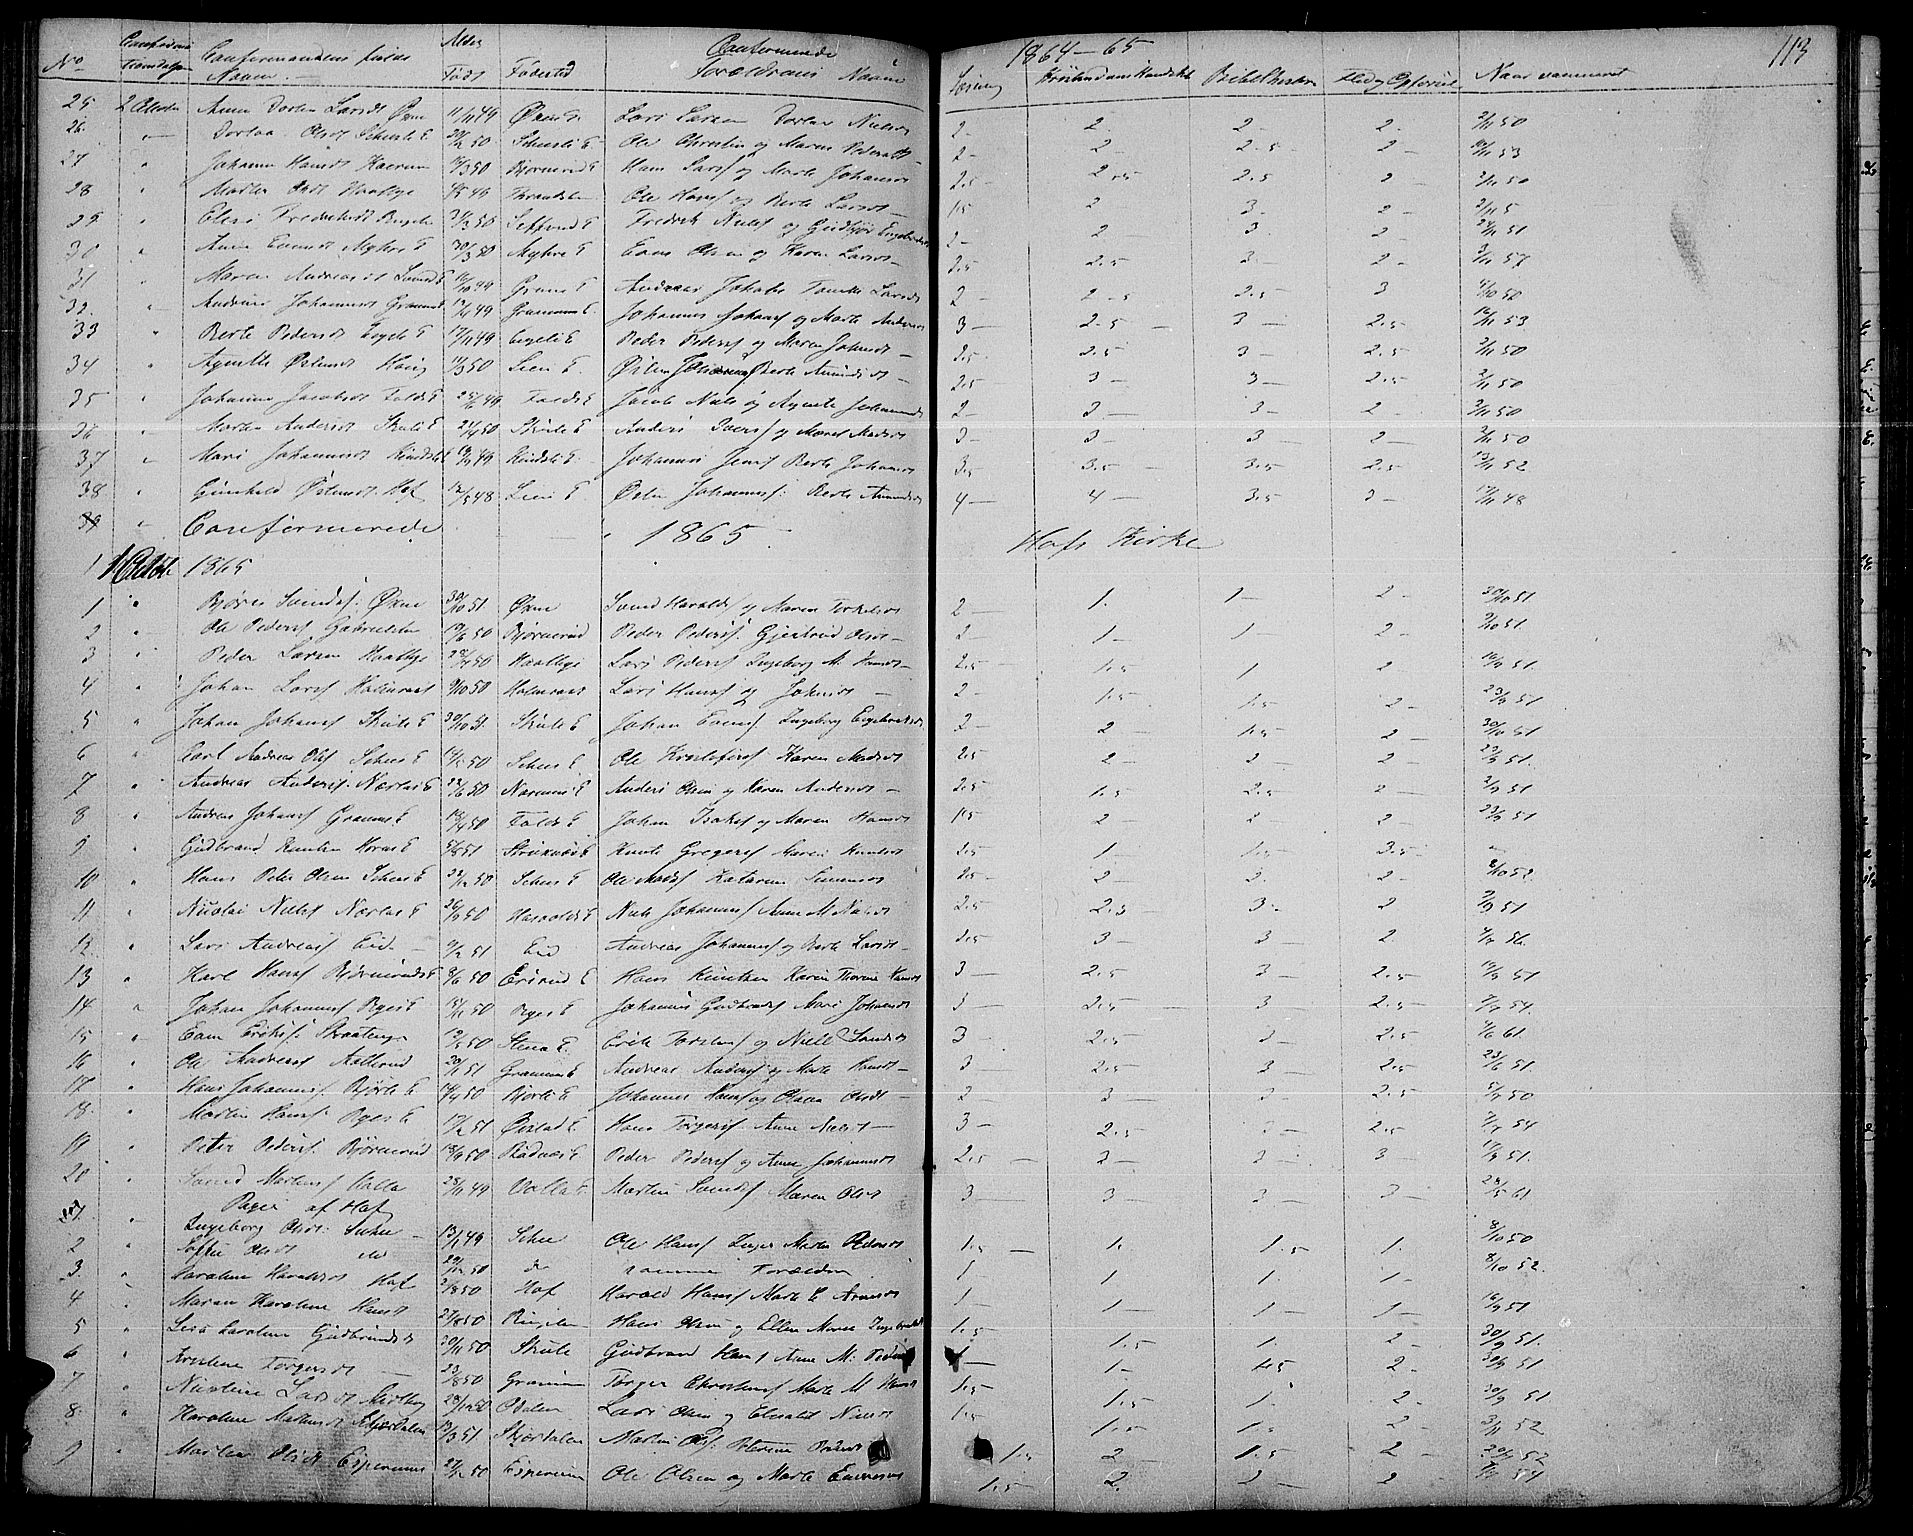 SAH, Søndre Land prestekontor, L/L0001: Klokkerbok nr. 1, 1849-1883, s. 113